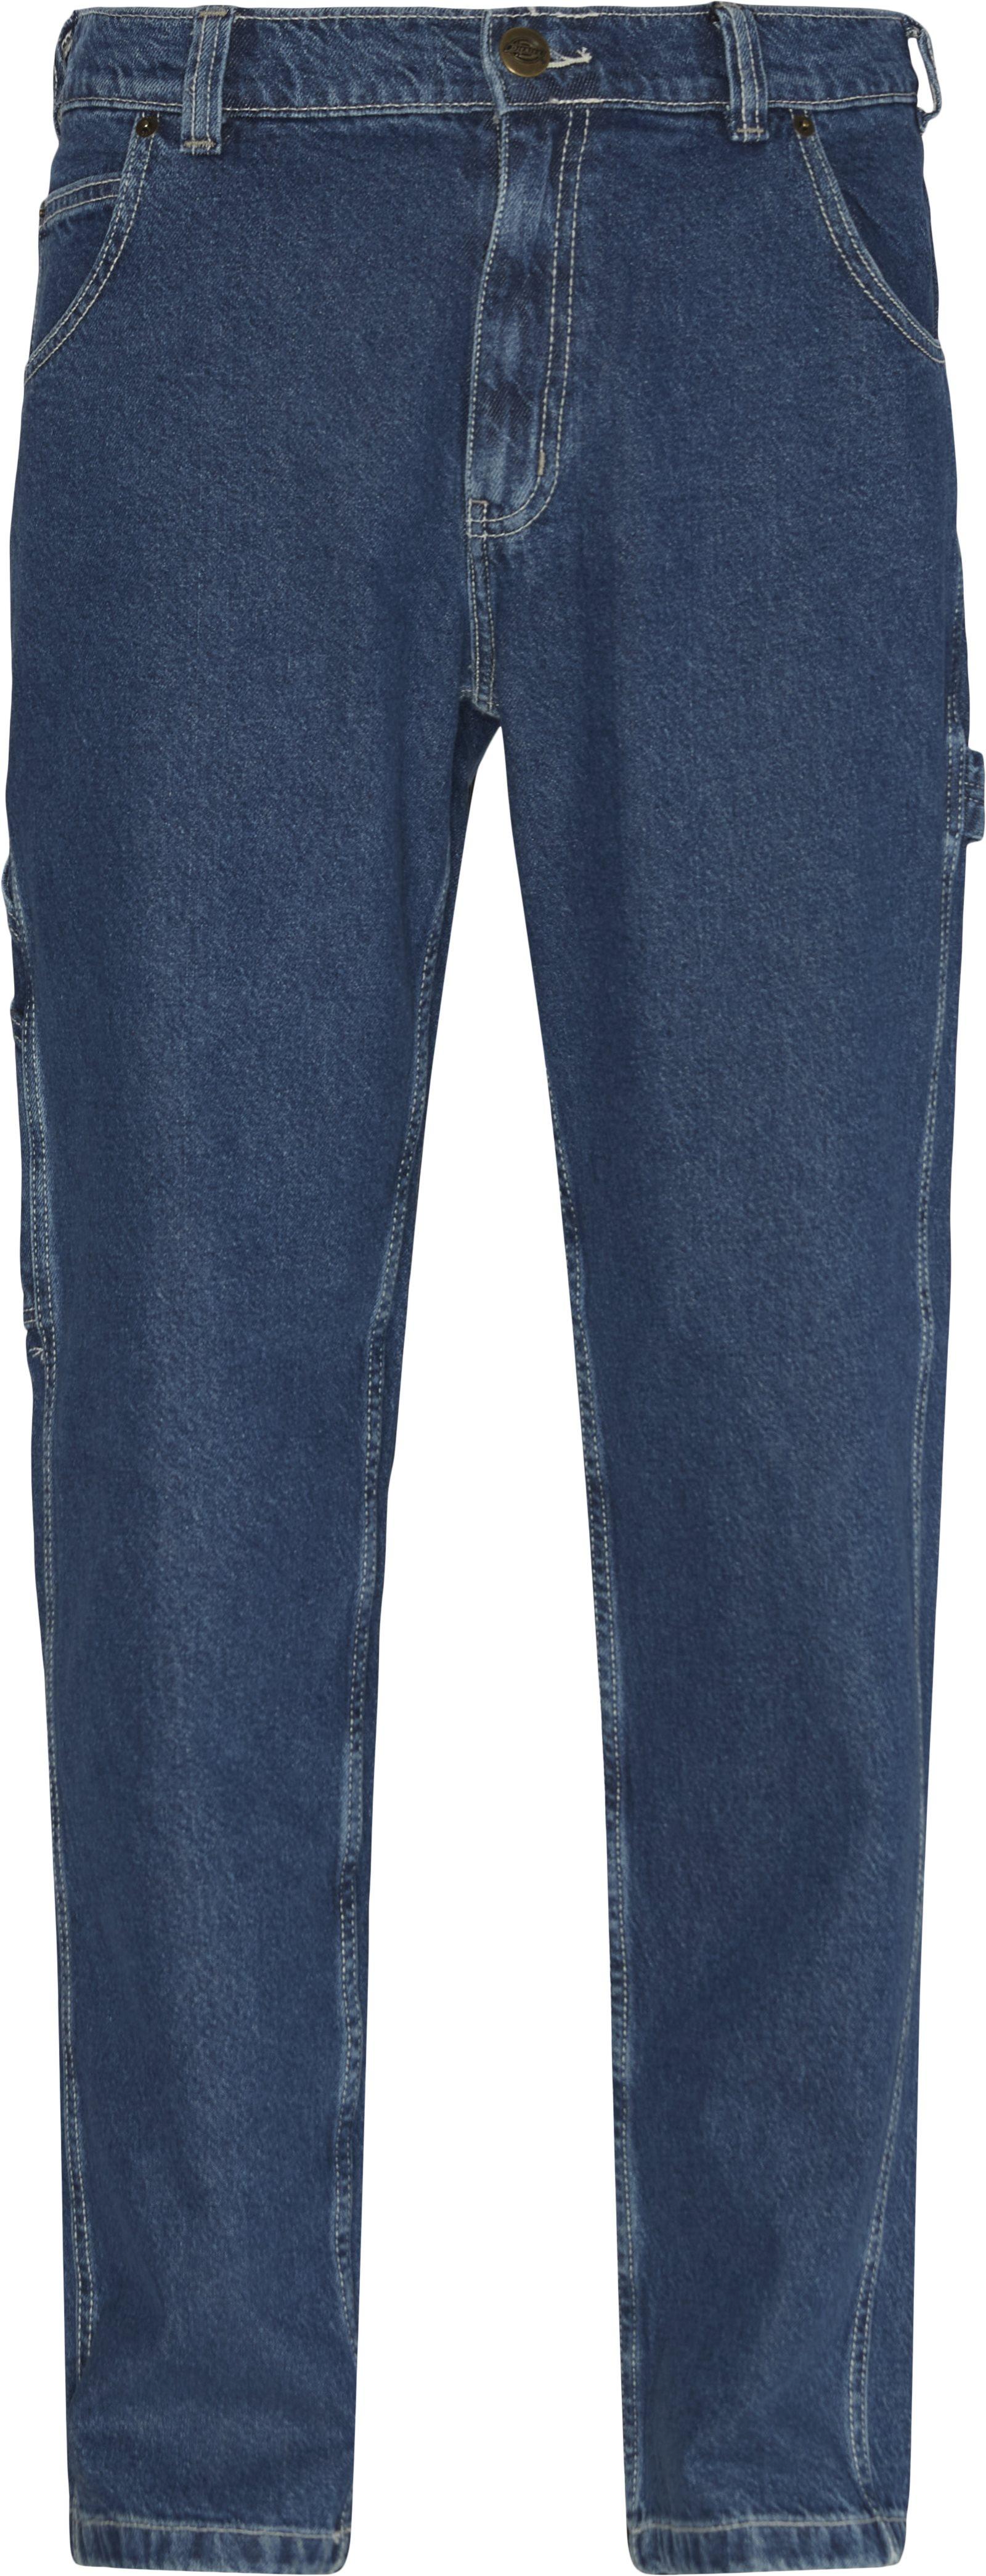 Garyville - Jeans - Regular fit - Denim